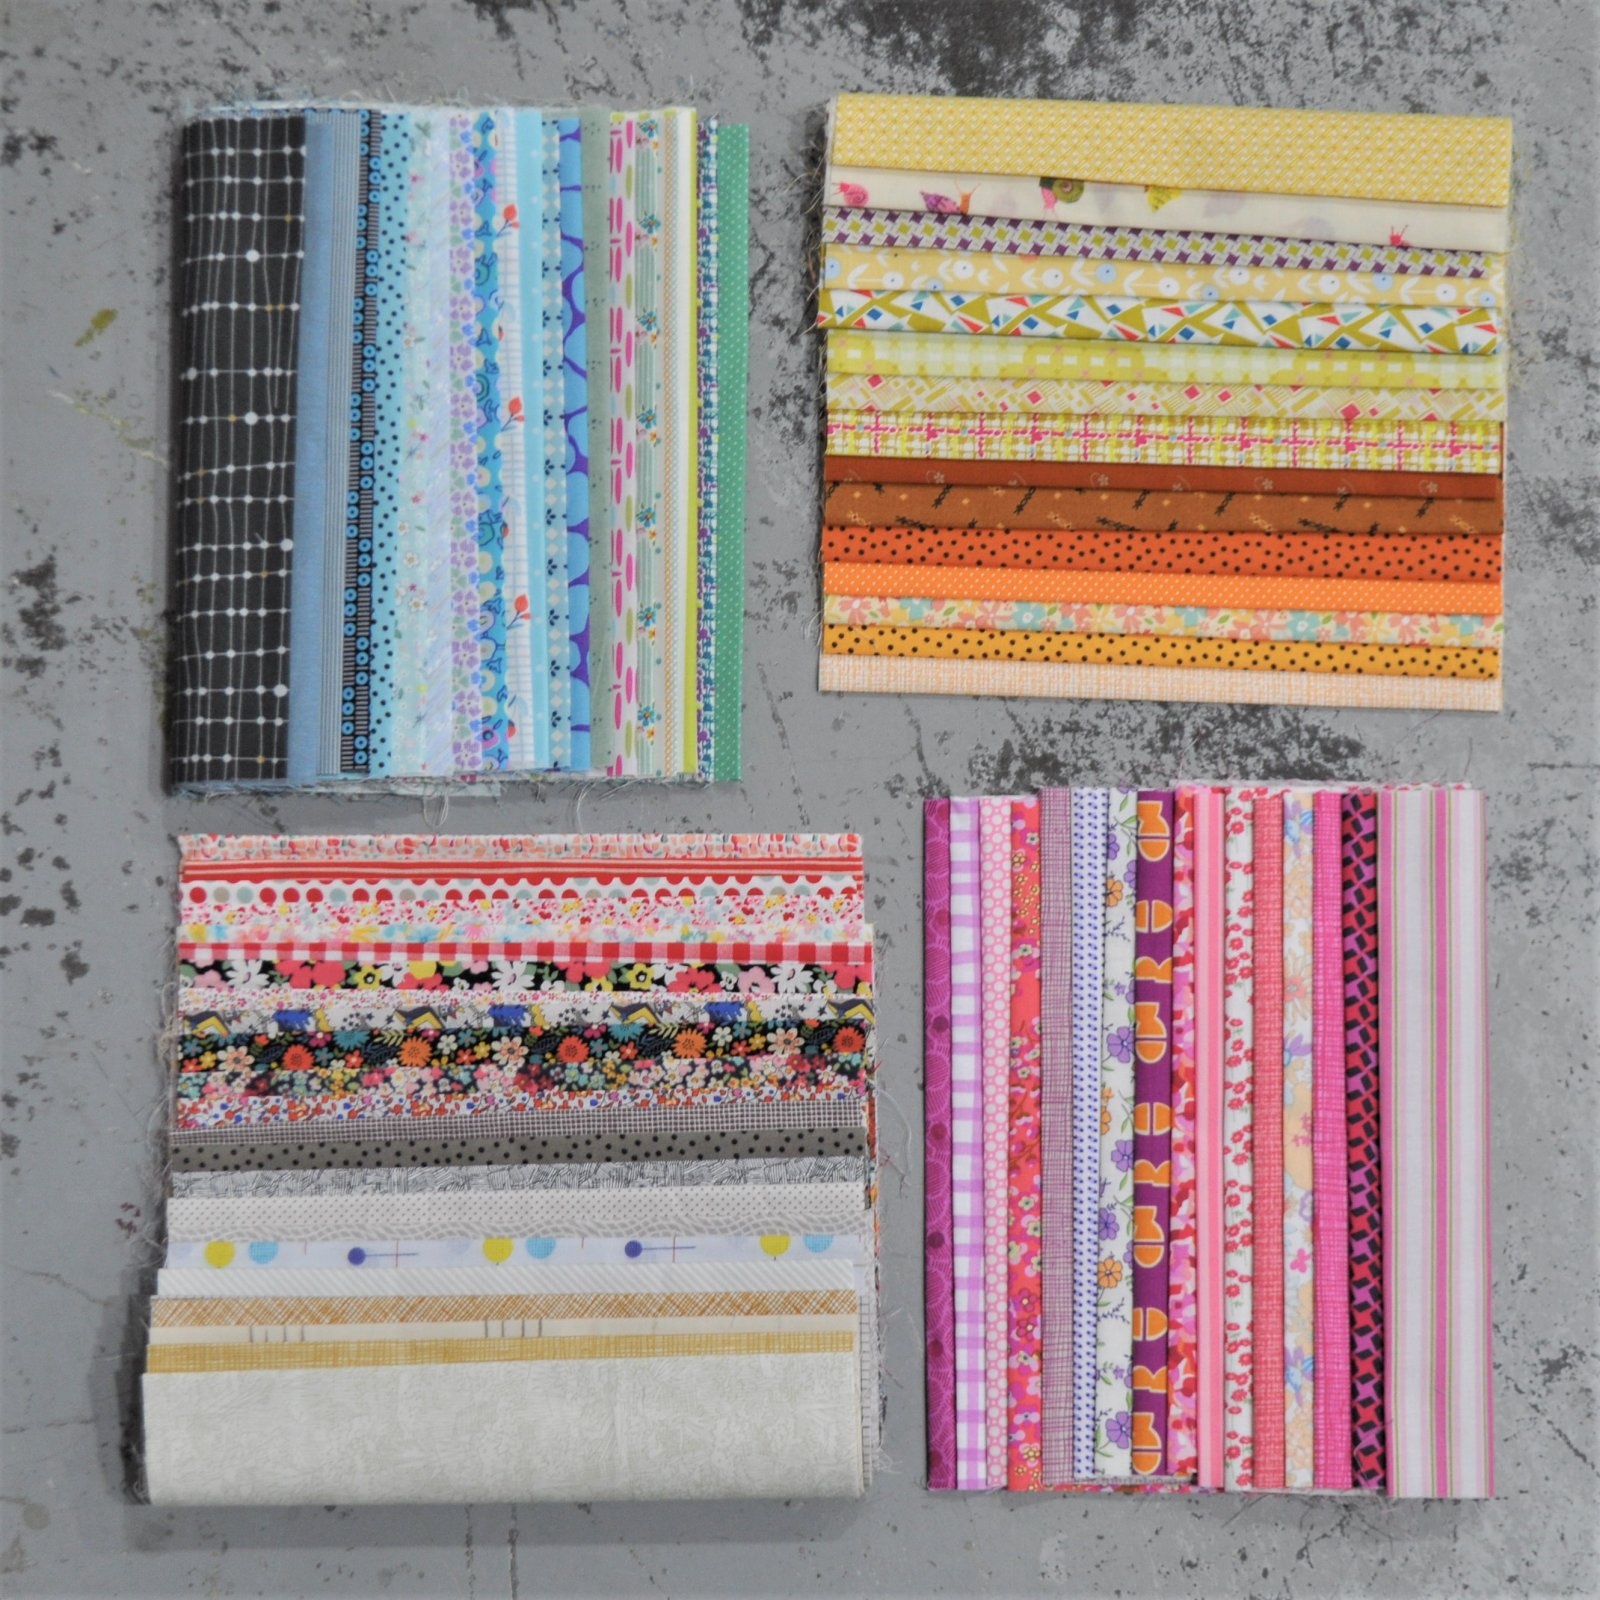 Queens Cross - Starter Kit - Fabric & Pattern